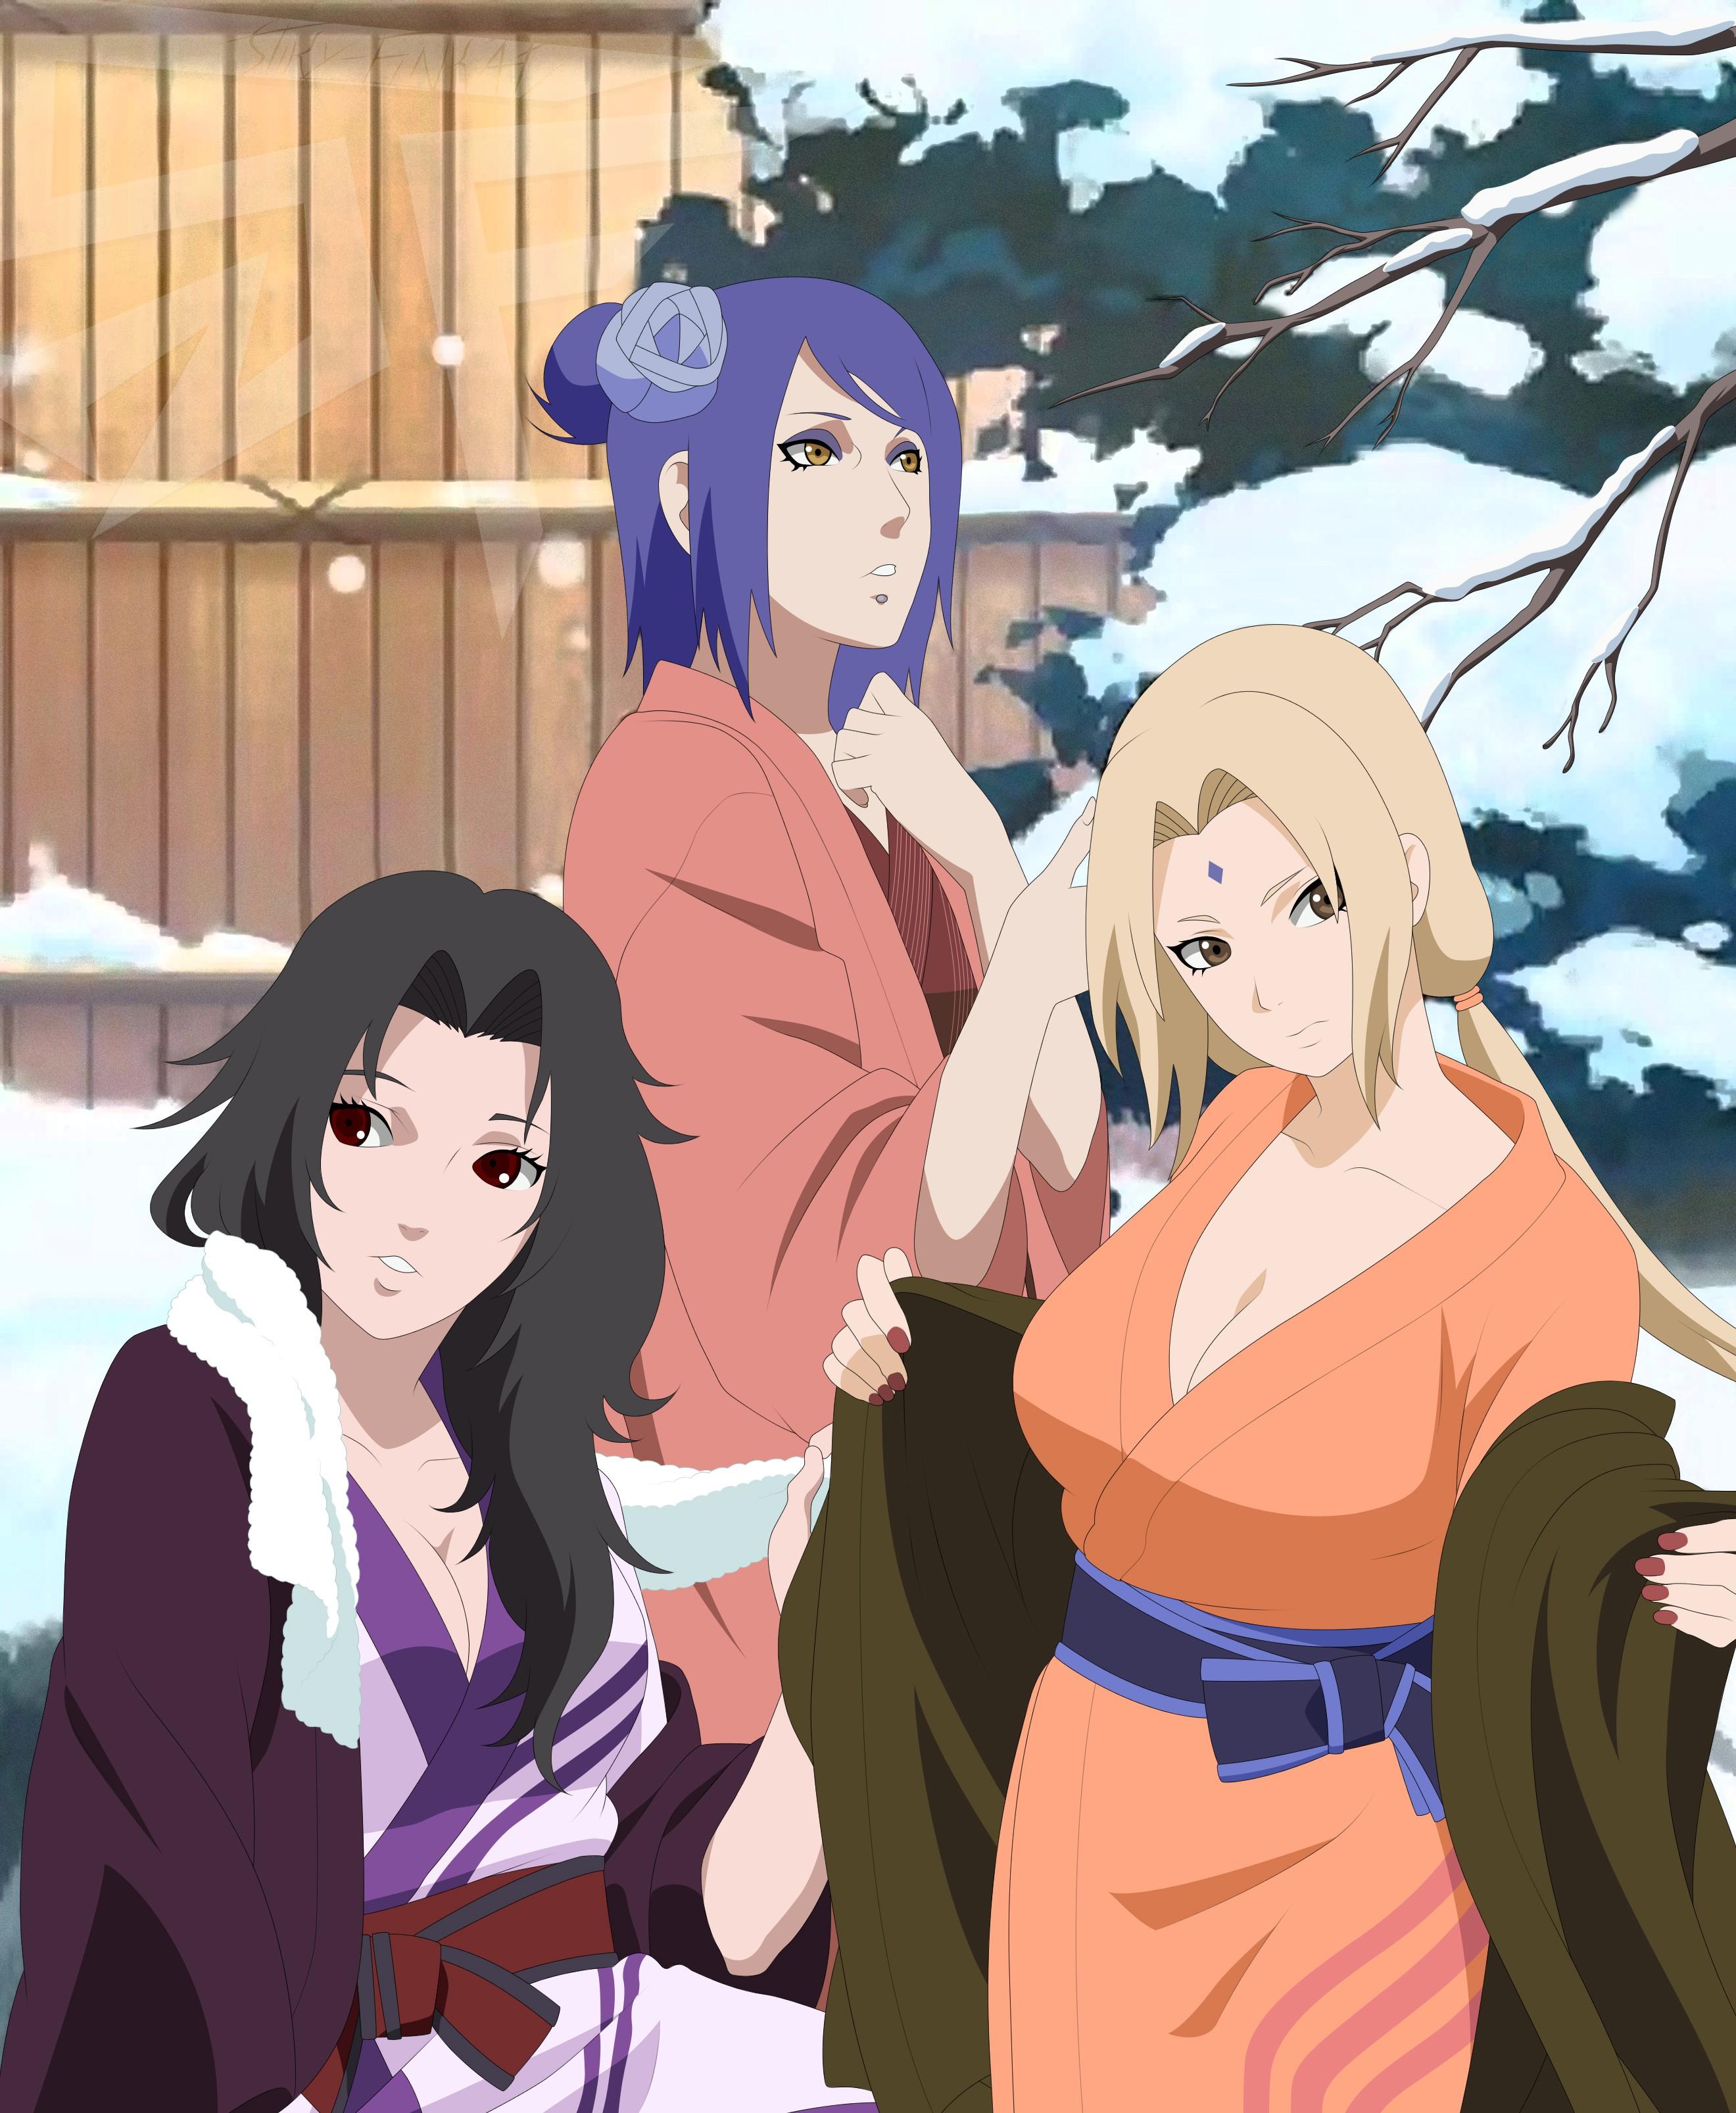 Anime 2640x3213 Naruto Shippuuden anime girls Tsunade Yuhi Kurenai Konan black hair blonde blue hair women trio purple hair winter snow